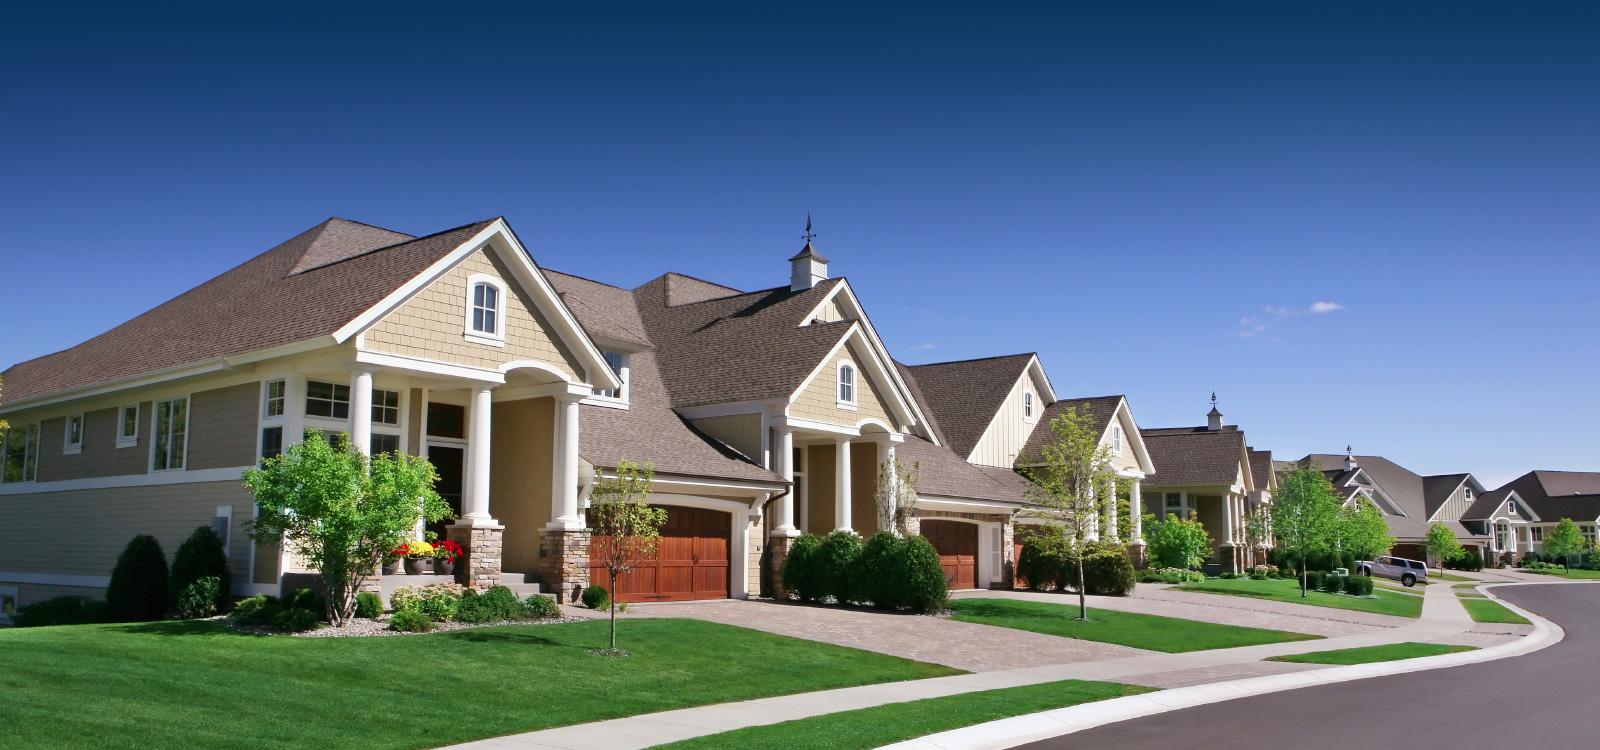 Home Inspection Checklist Birmingham